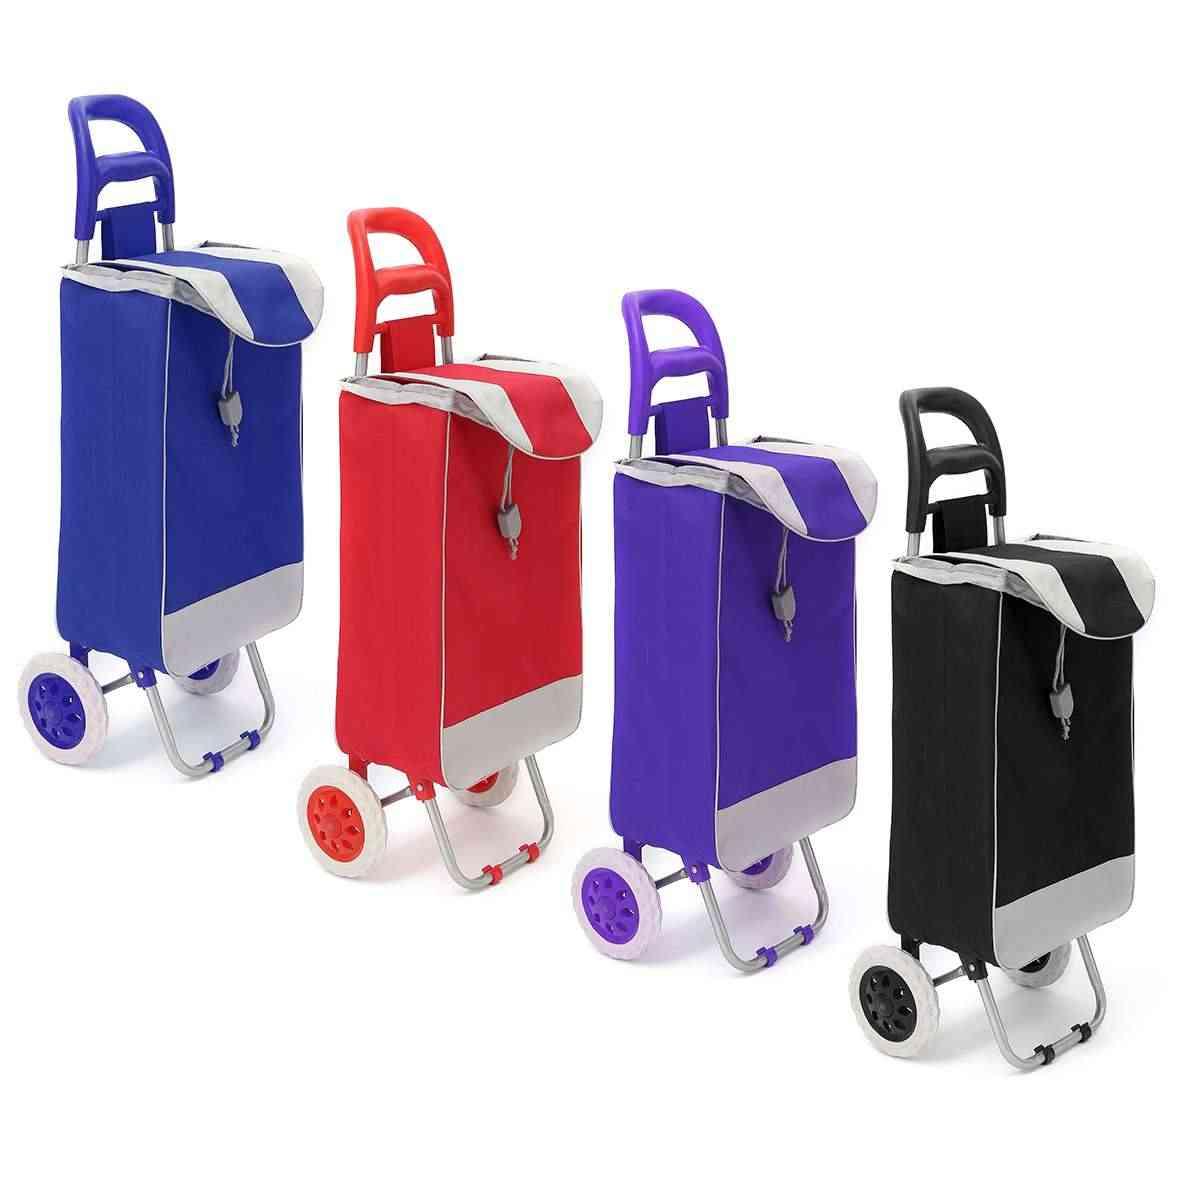 45L عربة تسوق قابلة للطي حقيبة على عجلات دفع حمل عربة عربات حقيبة العربة سلة الأمتعة عجلات أكسفورد النسيج قابلة للطي